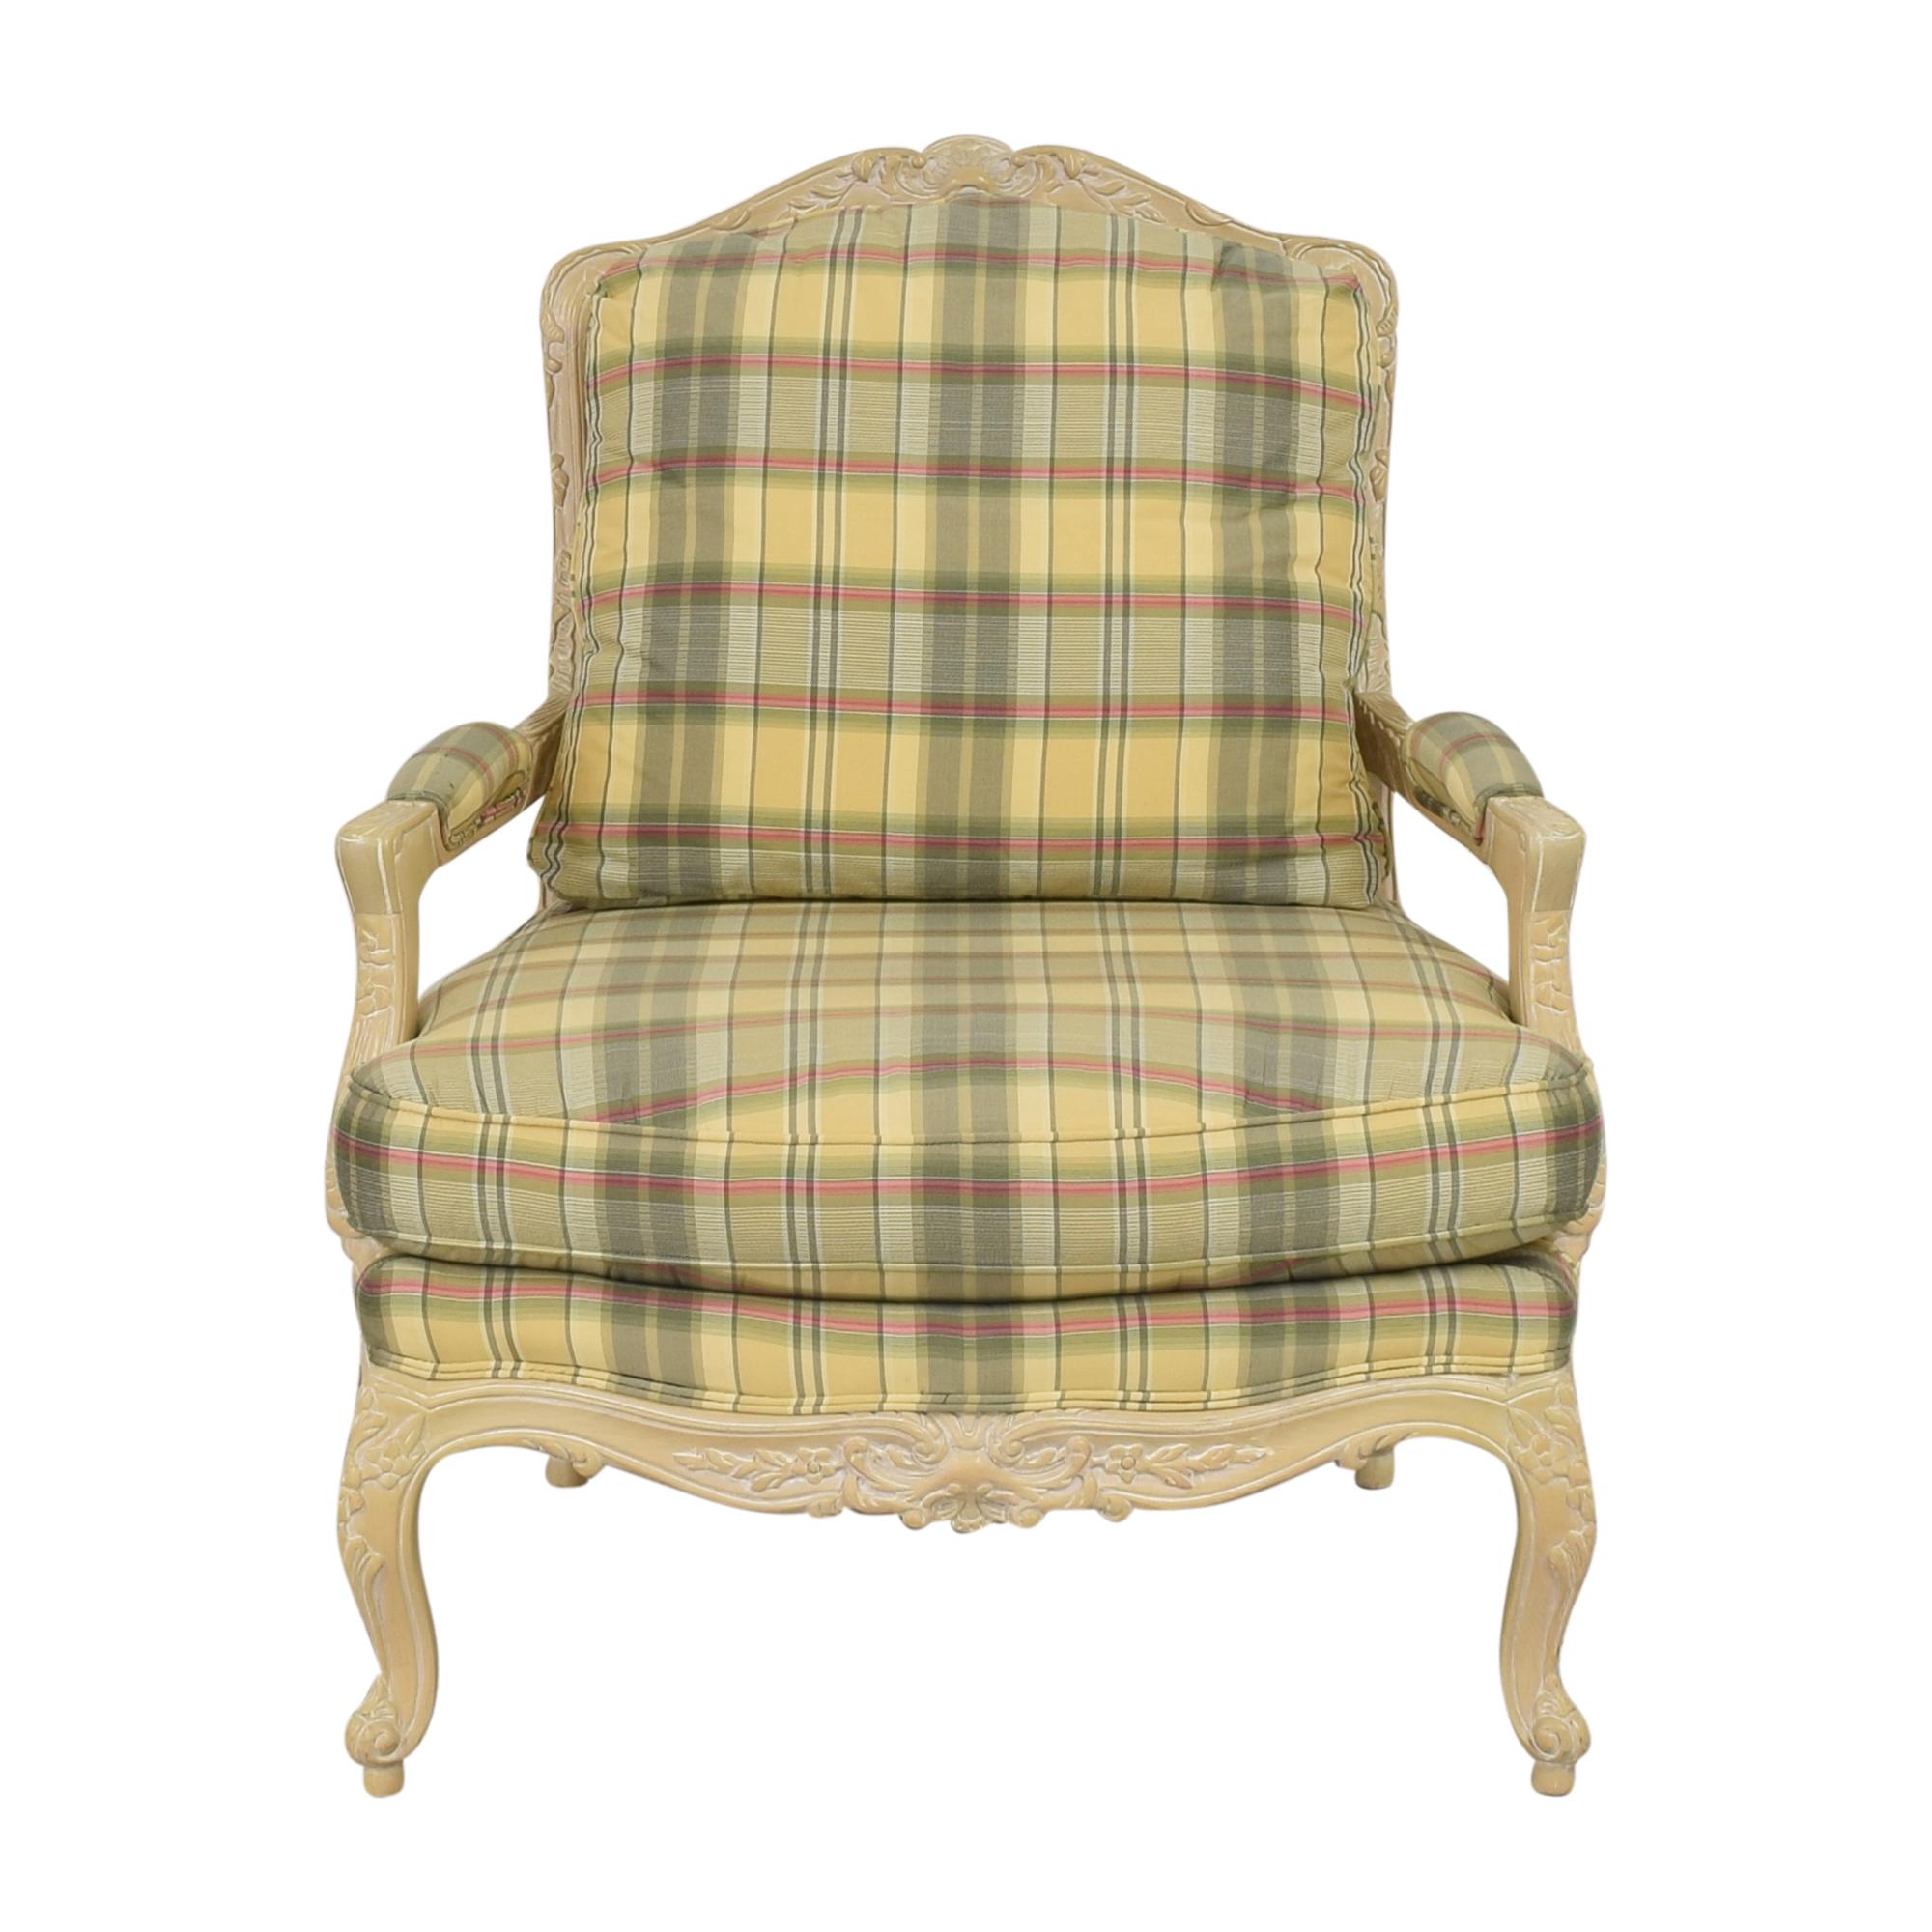 Sherrill Furniture Sherrill Furniture Plaid Bergere Chair coupon